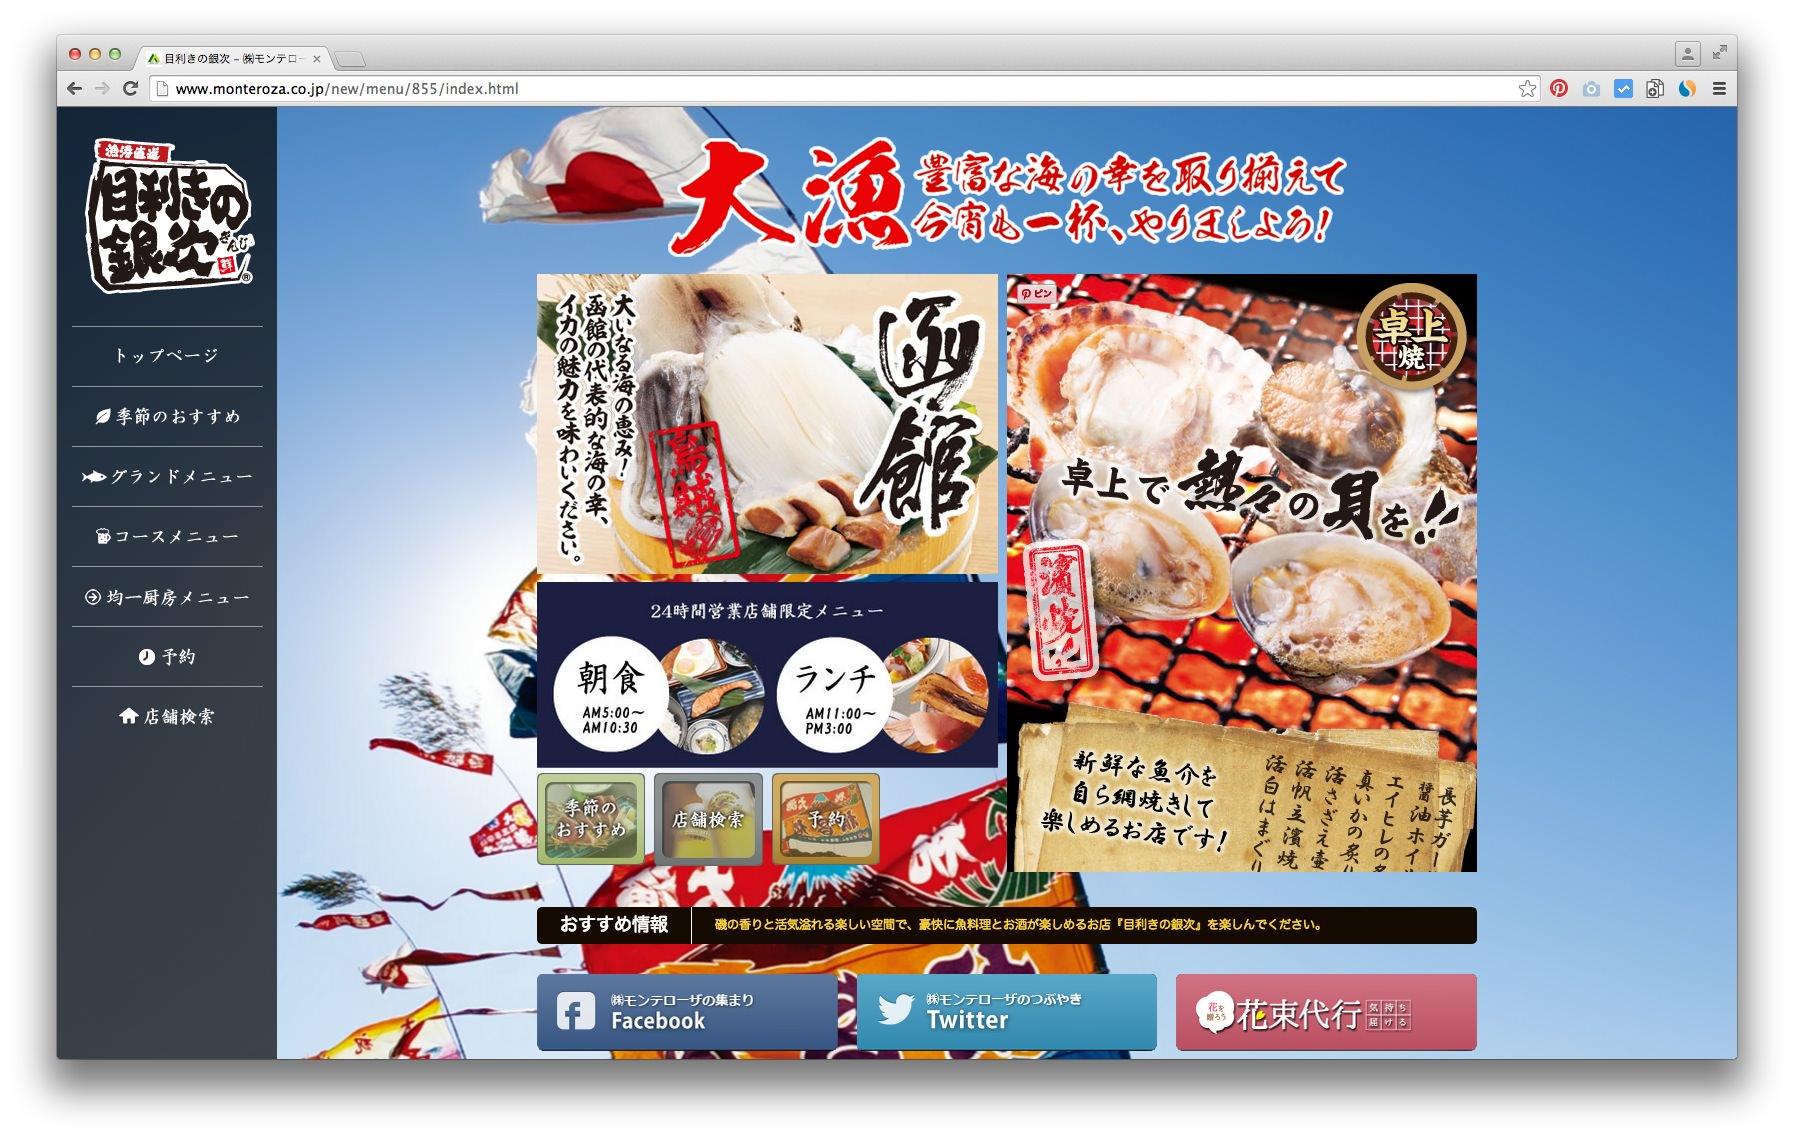 居酒屋「目利きの銀次 北本店」10月下旬OPEN 駅徒歩5分